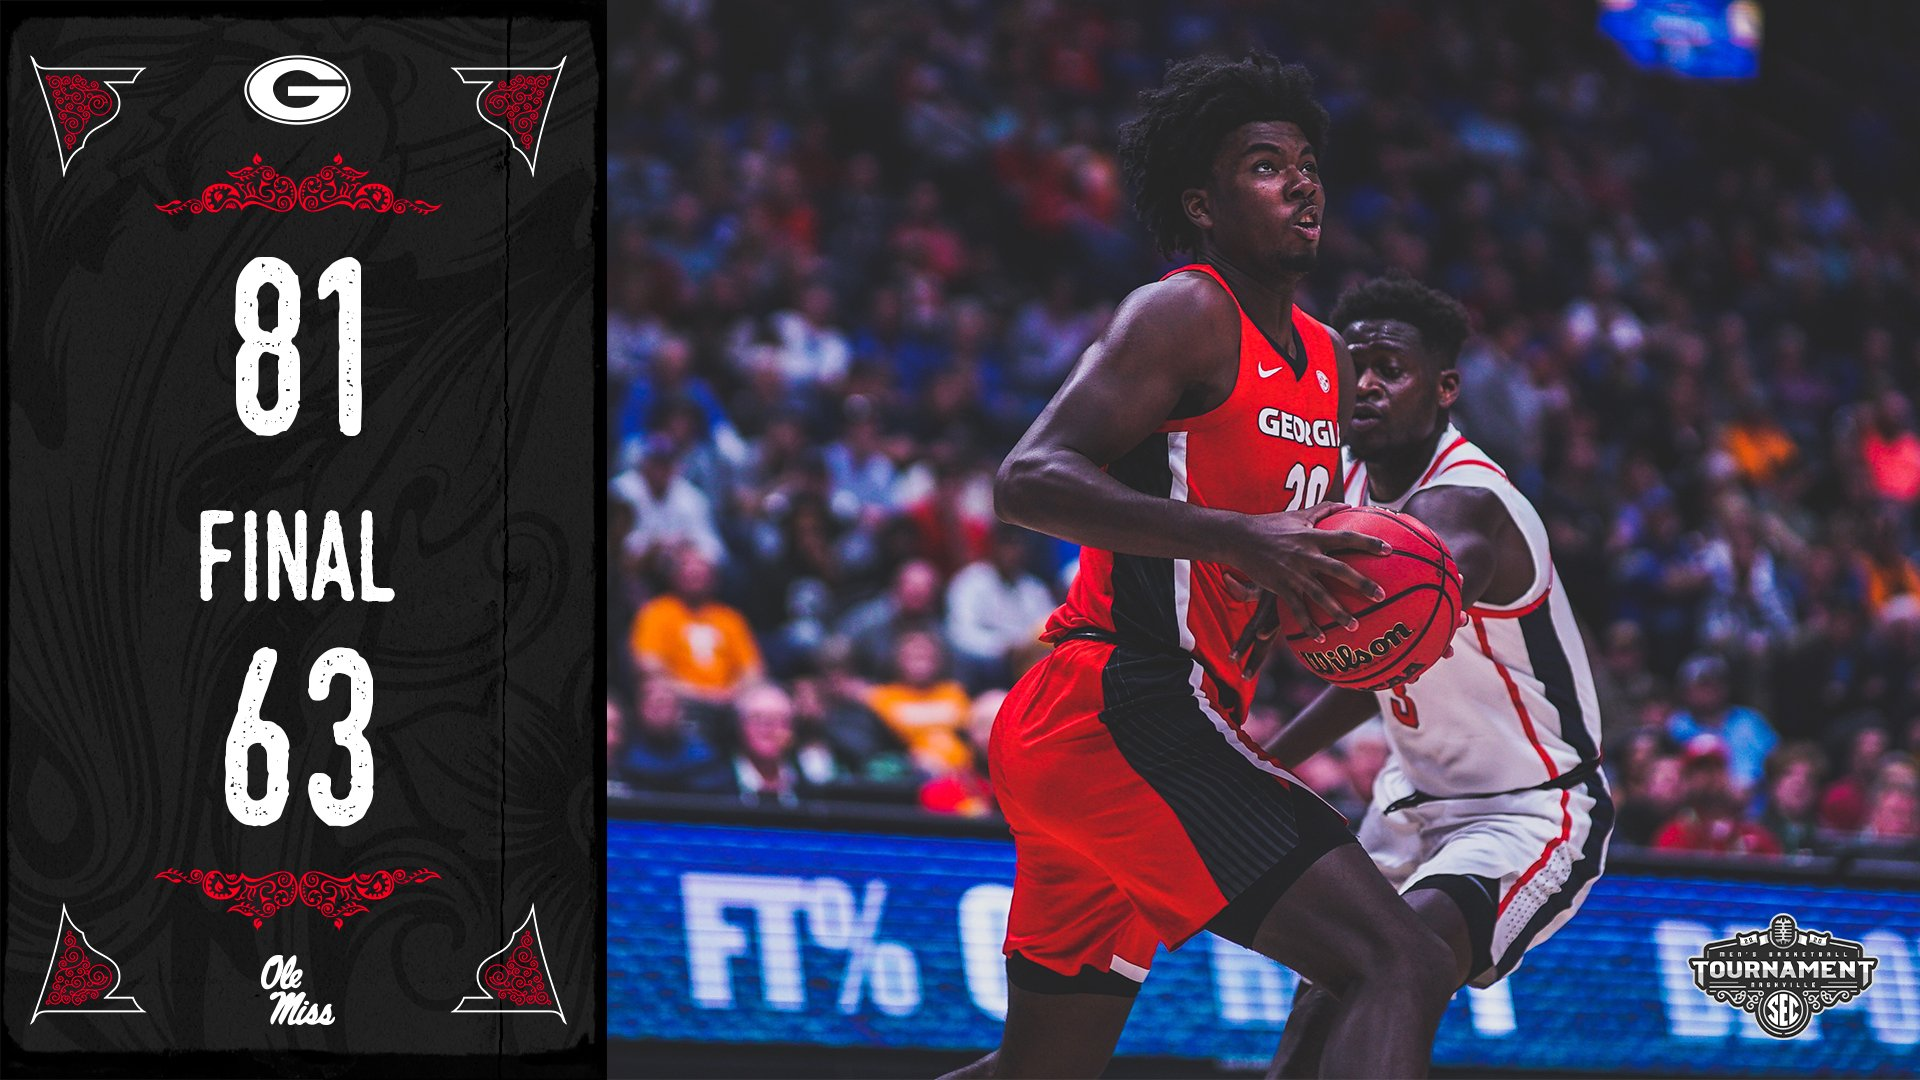 Photo Credit: UGA Basketball/Twitter